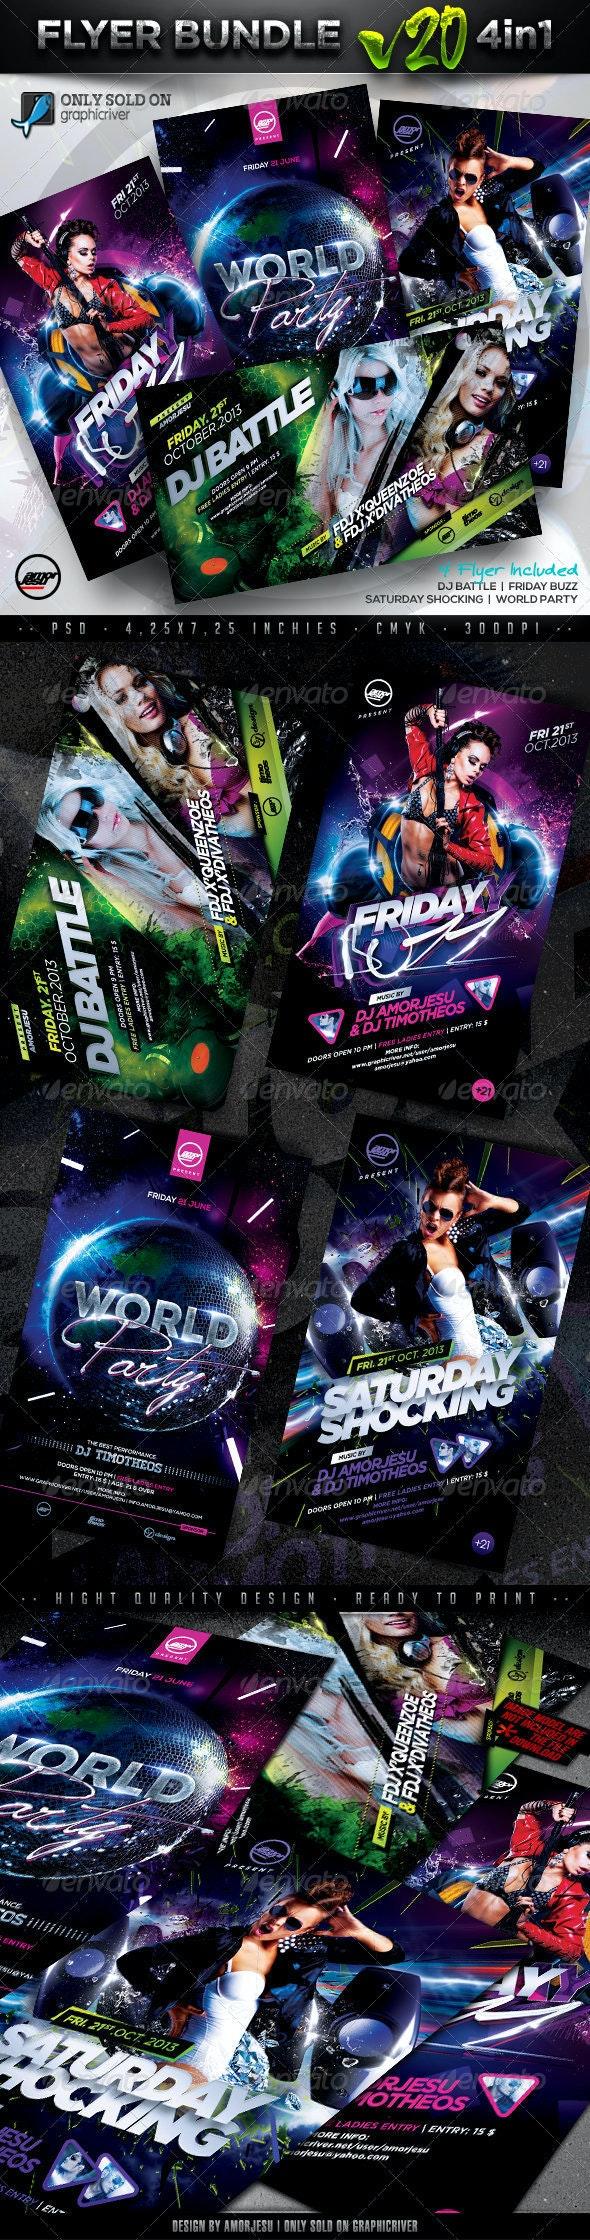 Flyer Bundle Vol20 - 4 in 1 - Clubs & Parties Events